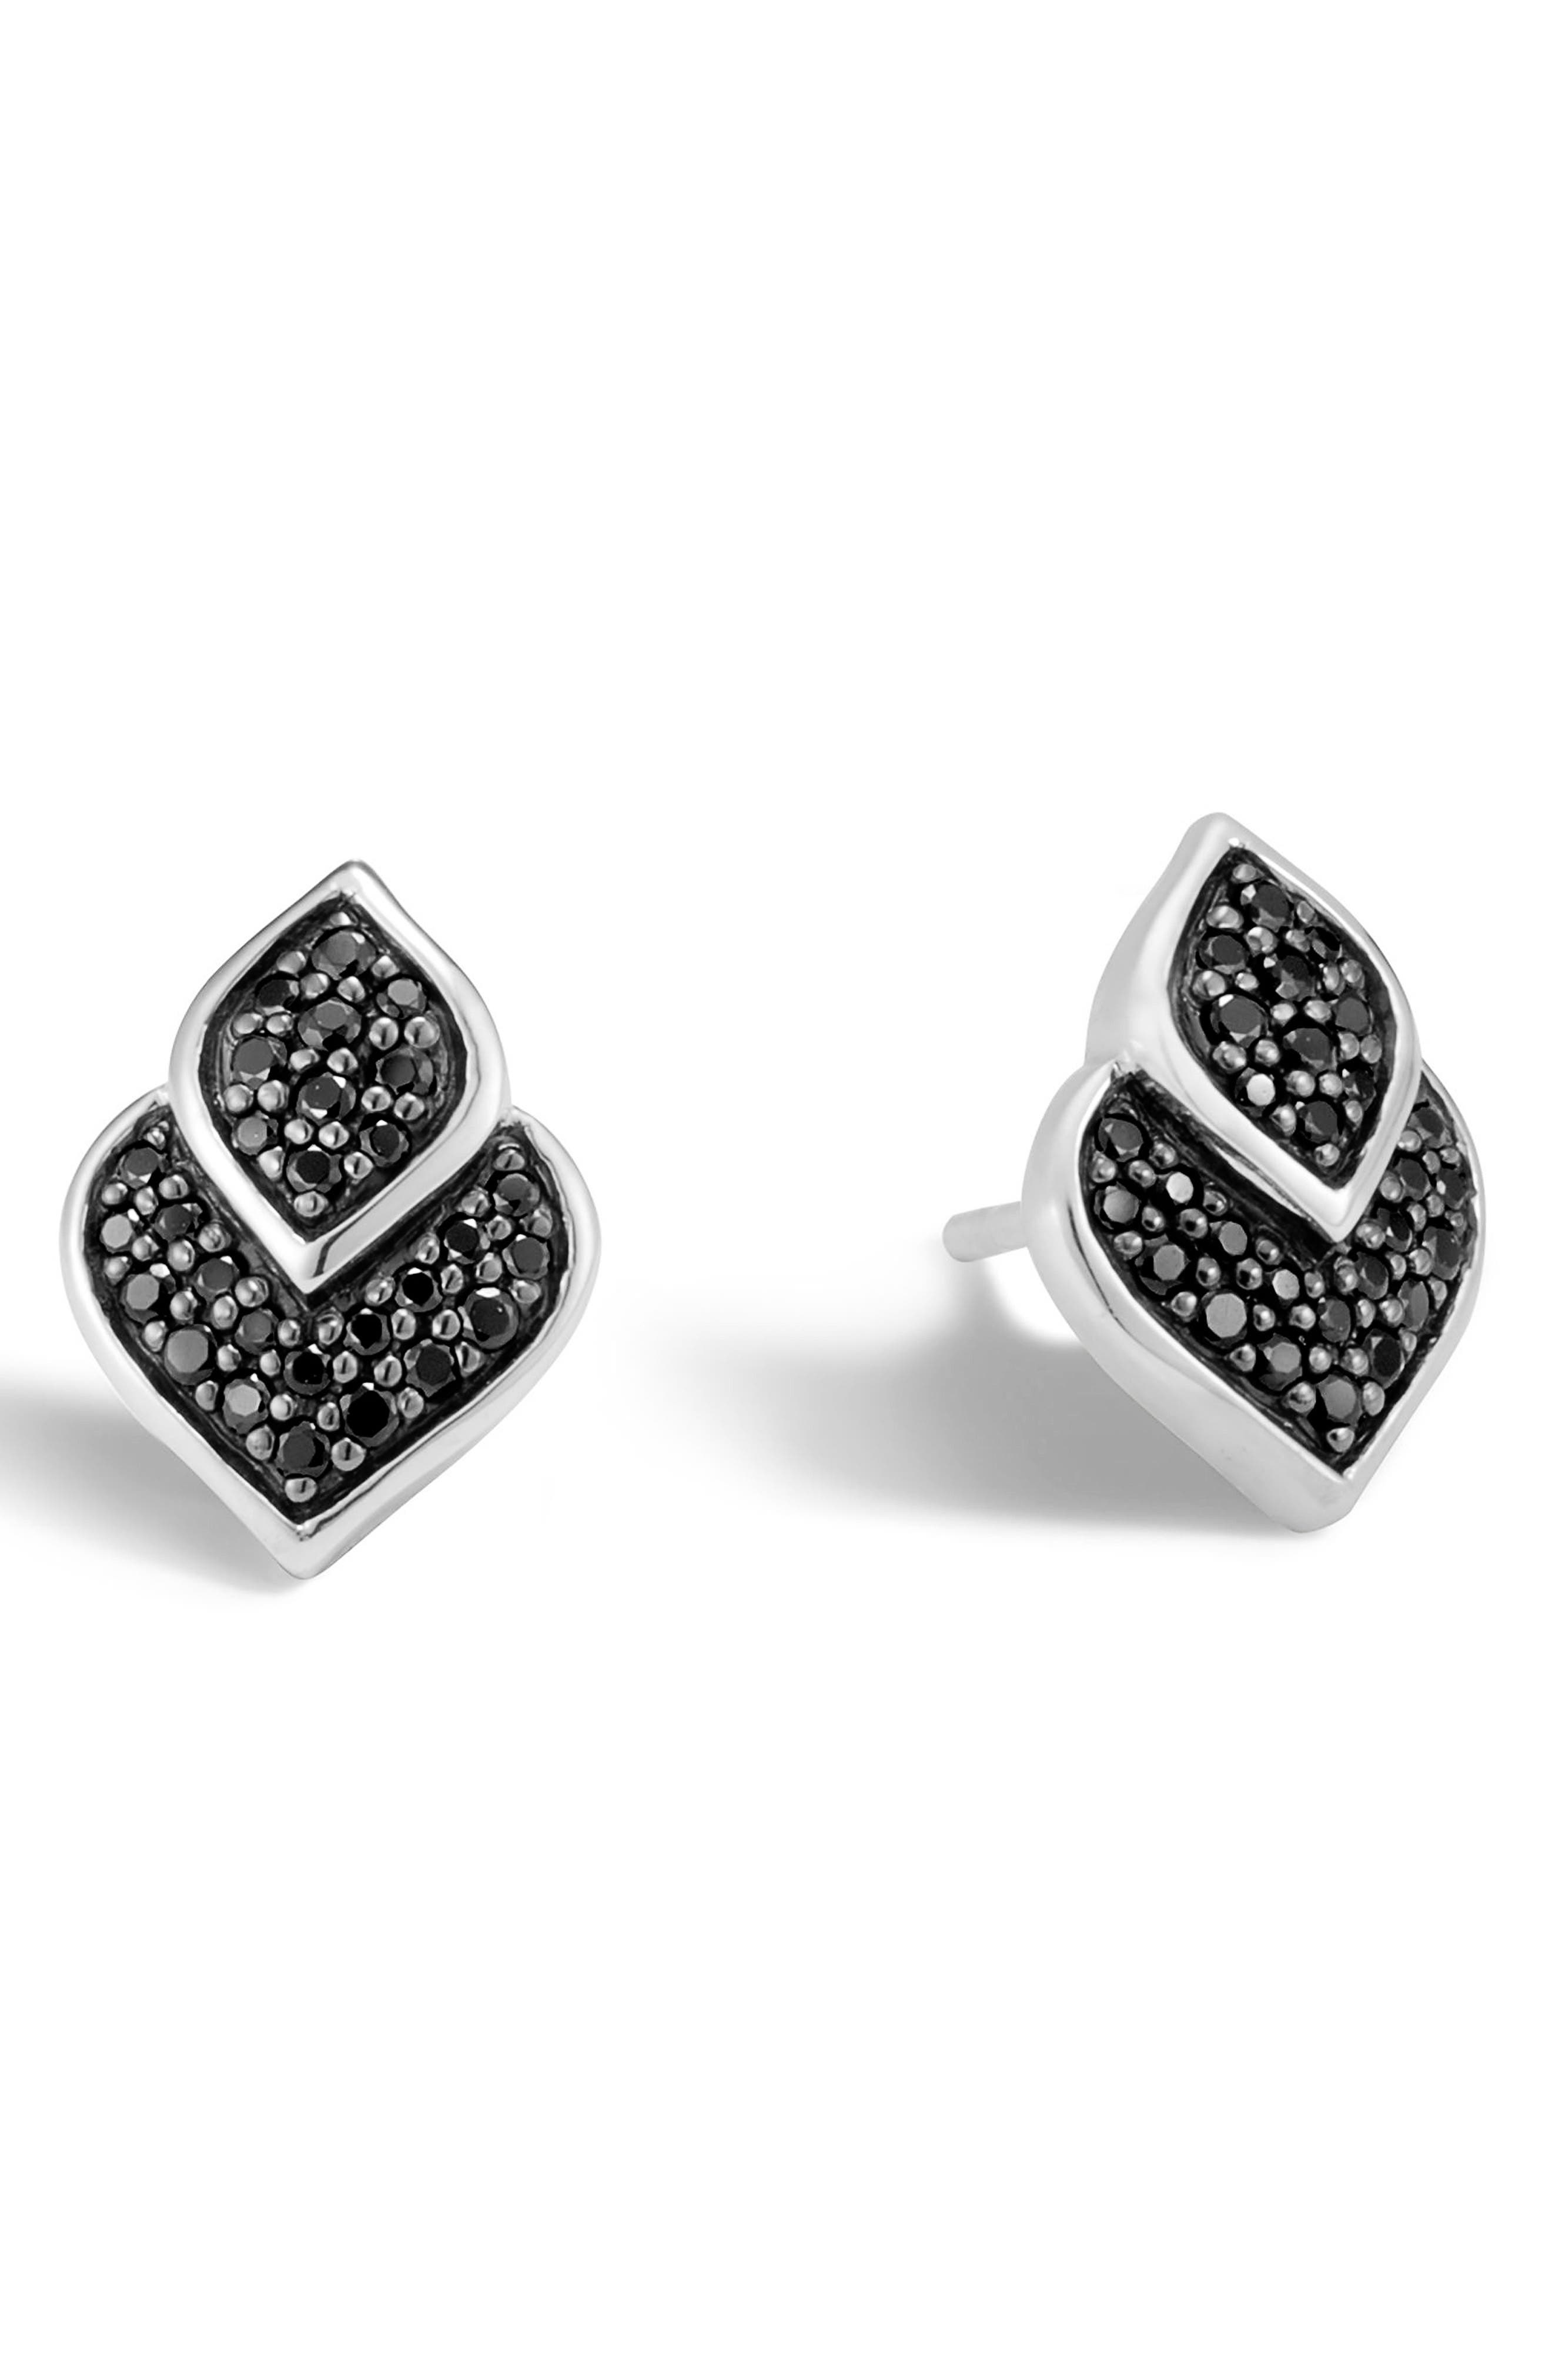 Legends Naga Stud Earrings,                             Main thumbnail 1, color,                             SILVER/ BLACK SAPPHIRE